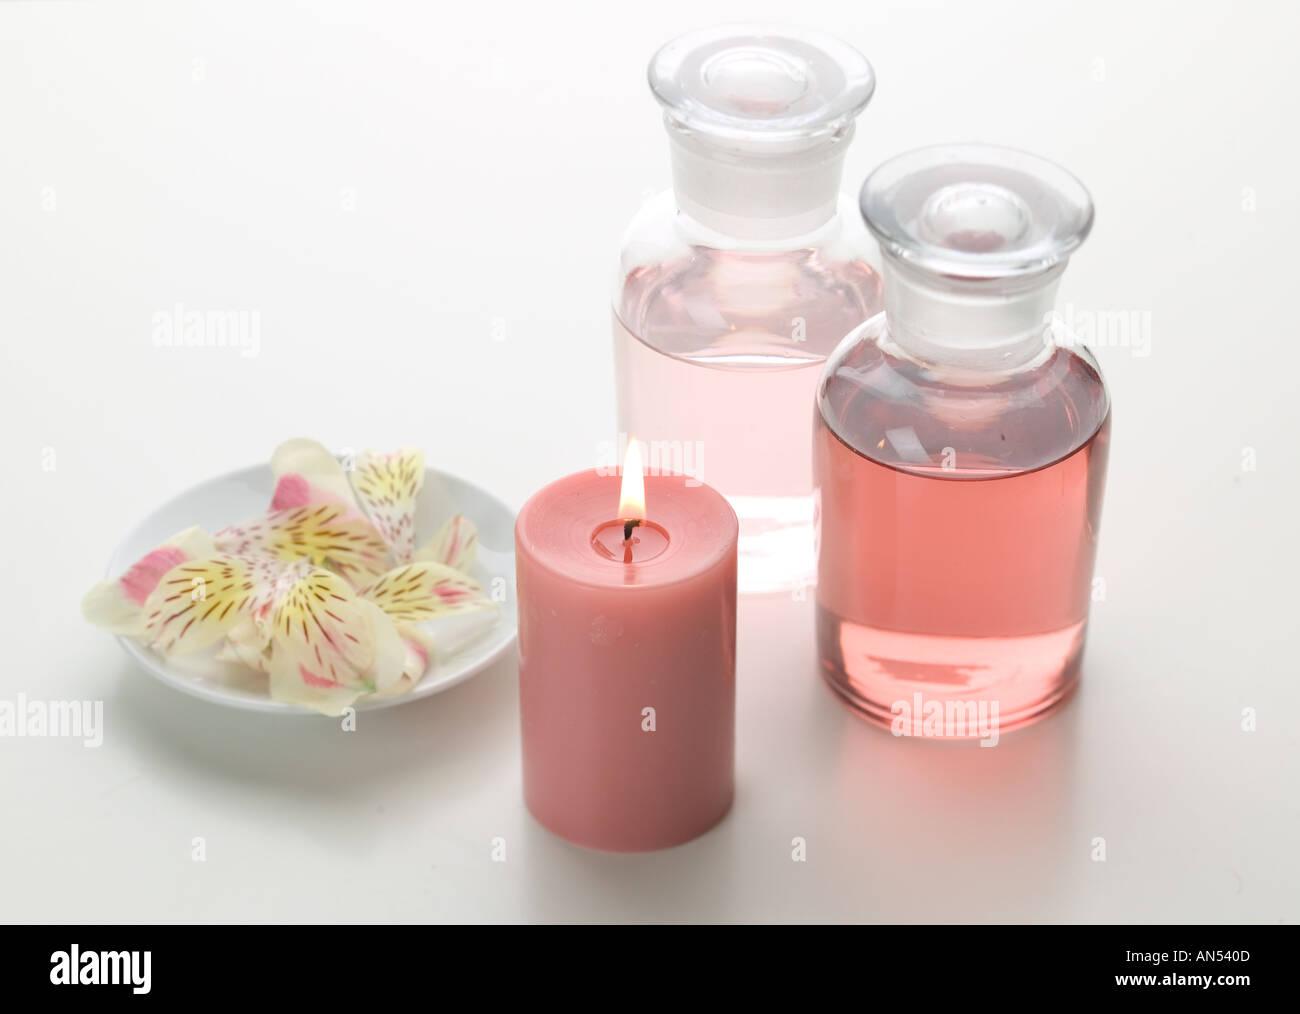 Aroma therapy items - Stock Image